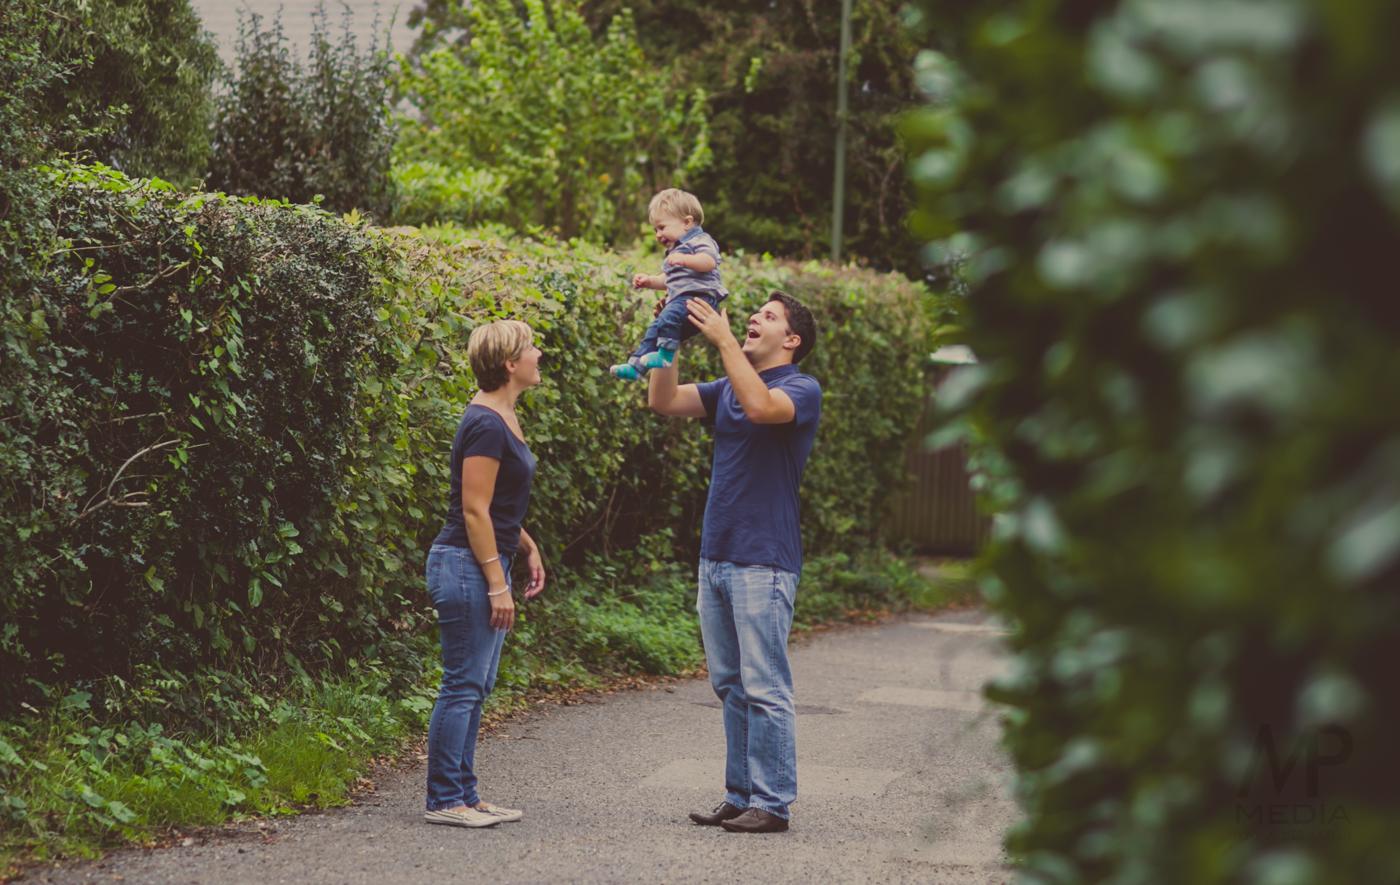 016 - Kelly, Matthew and Hugo Fine Art Family Photography by www.mpmedia.co.uk -92.JPG